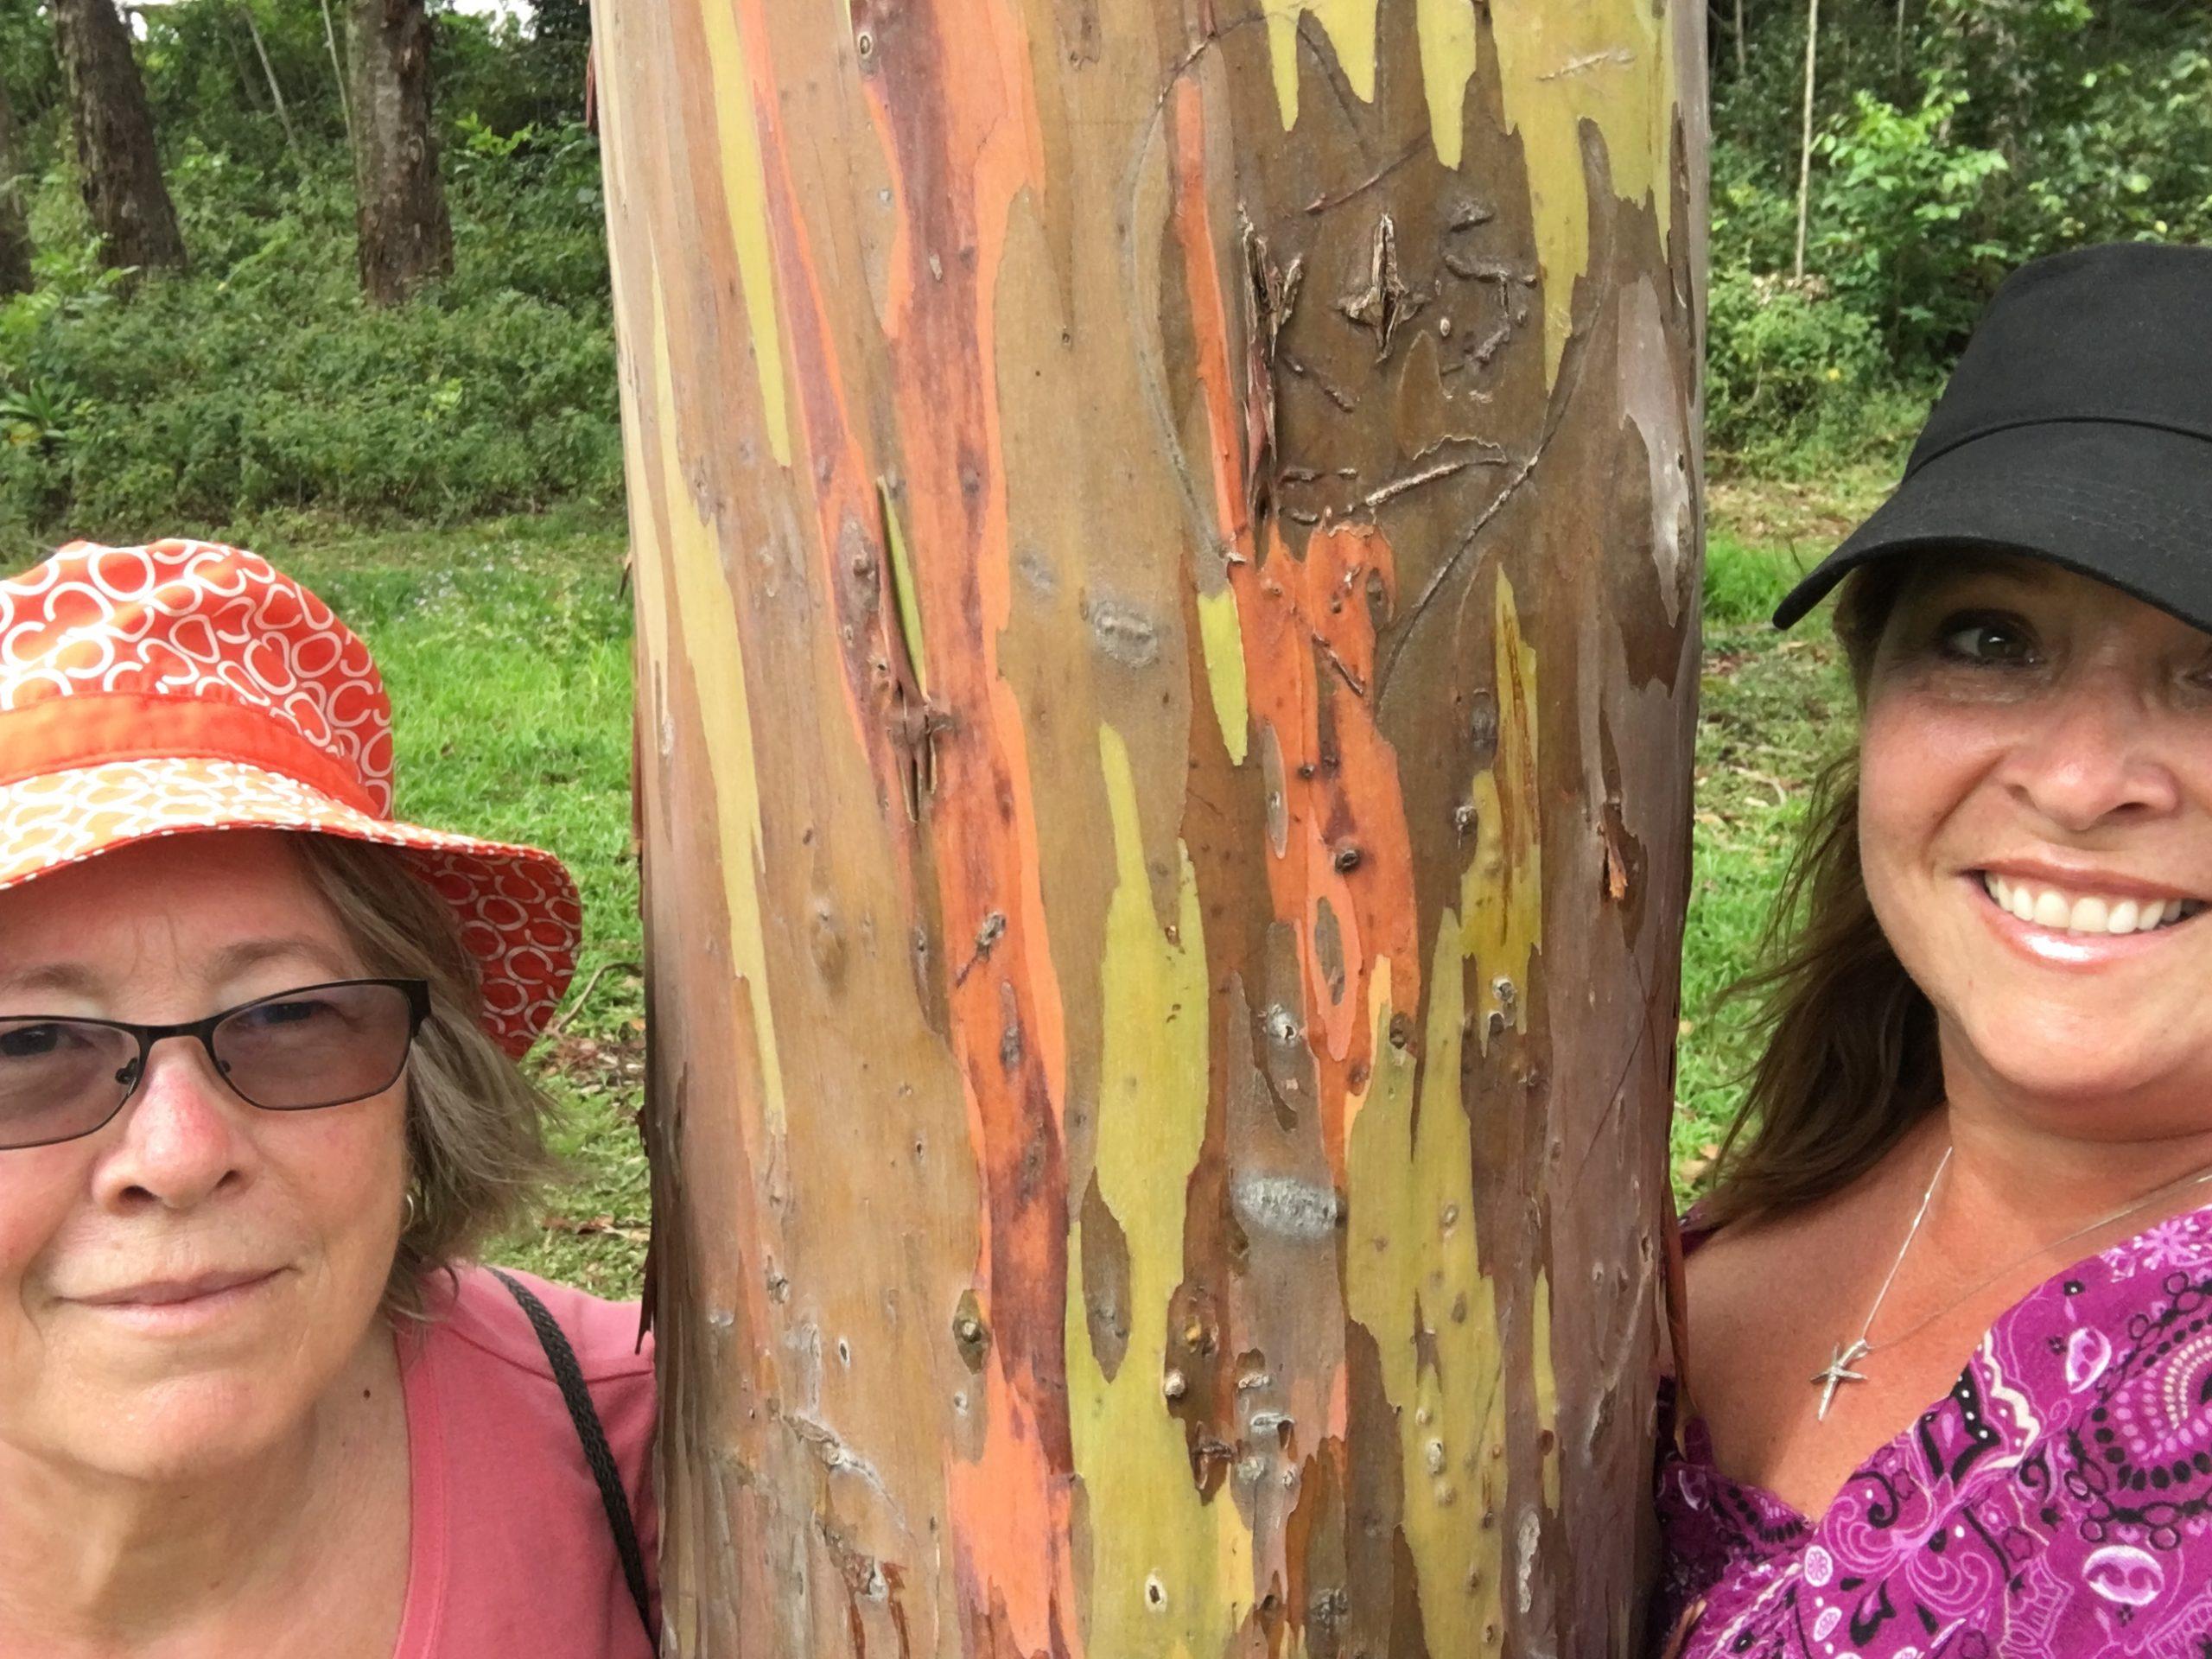 Rainbow eucalyptus at the Keahua Arboretum, Kauai, Hawaii